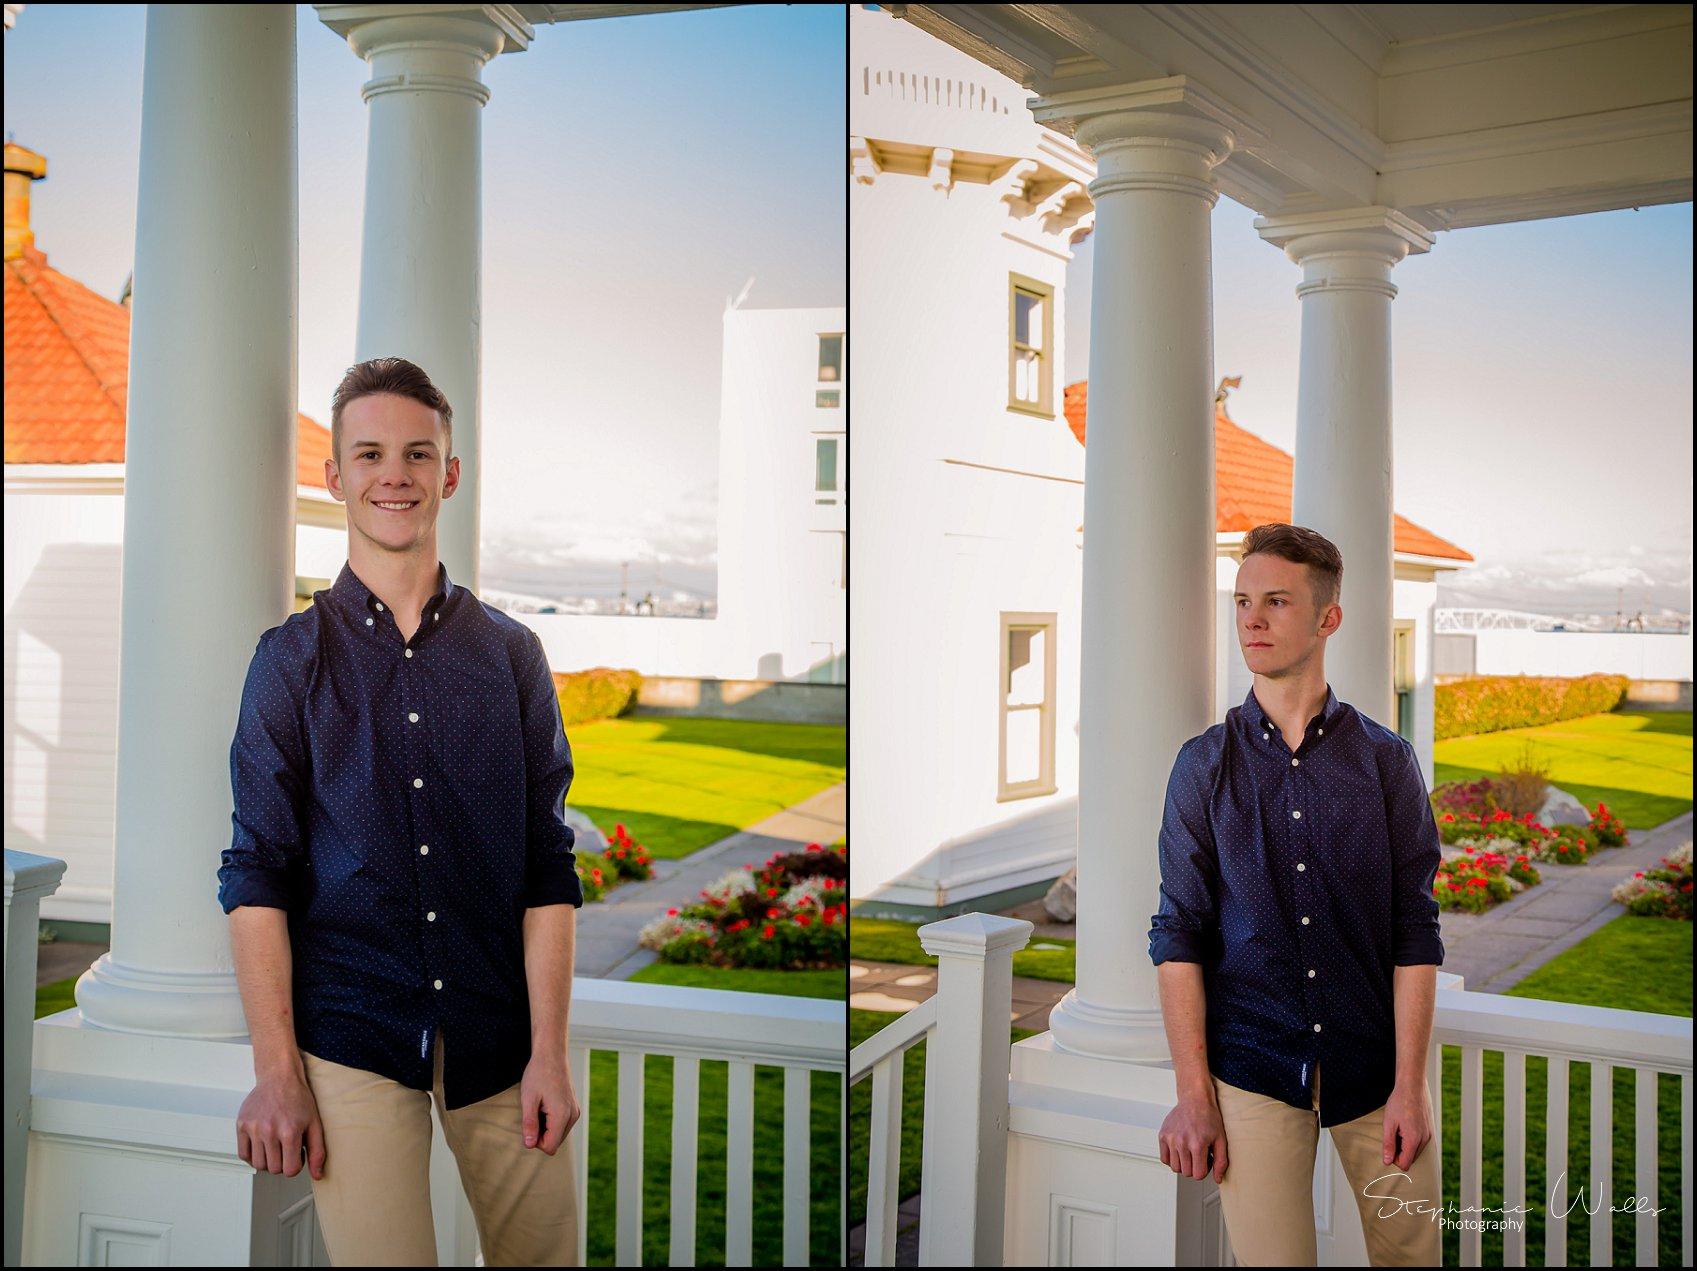 Josh Co2018 005 Josh Co2018 | Mukilteo Lighthouse Park | Bothell High School Senior Photographer